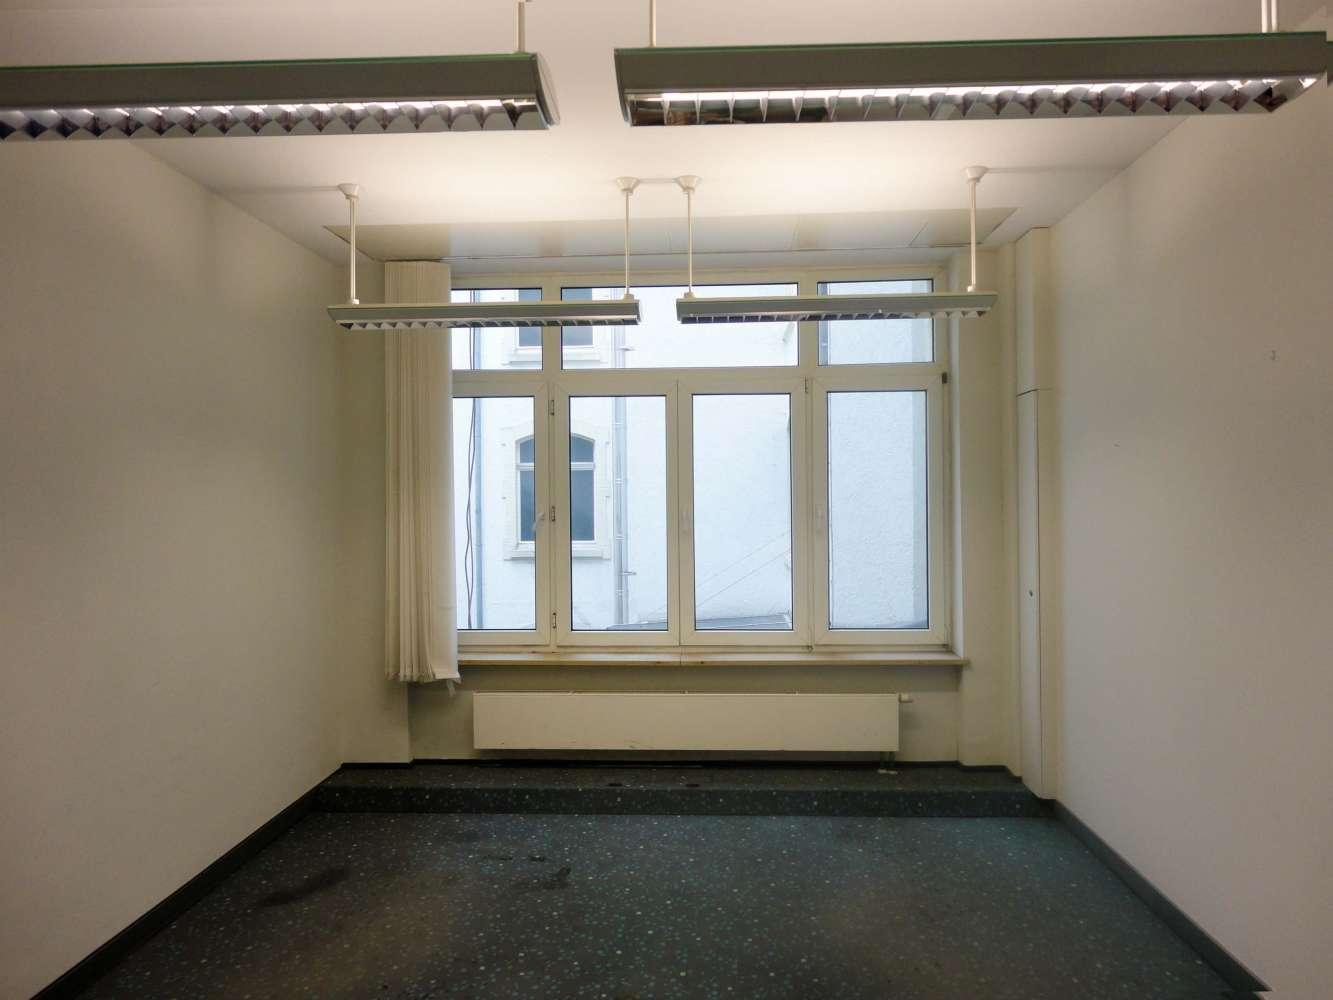 Büros Frankfurt am main, 60329 - Büro - Frankfurt am Main, Bahnhofsviertel - F0509 - 10553614